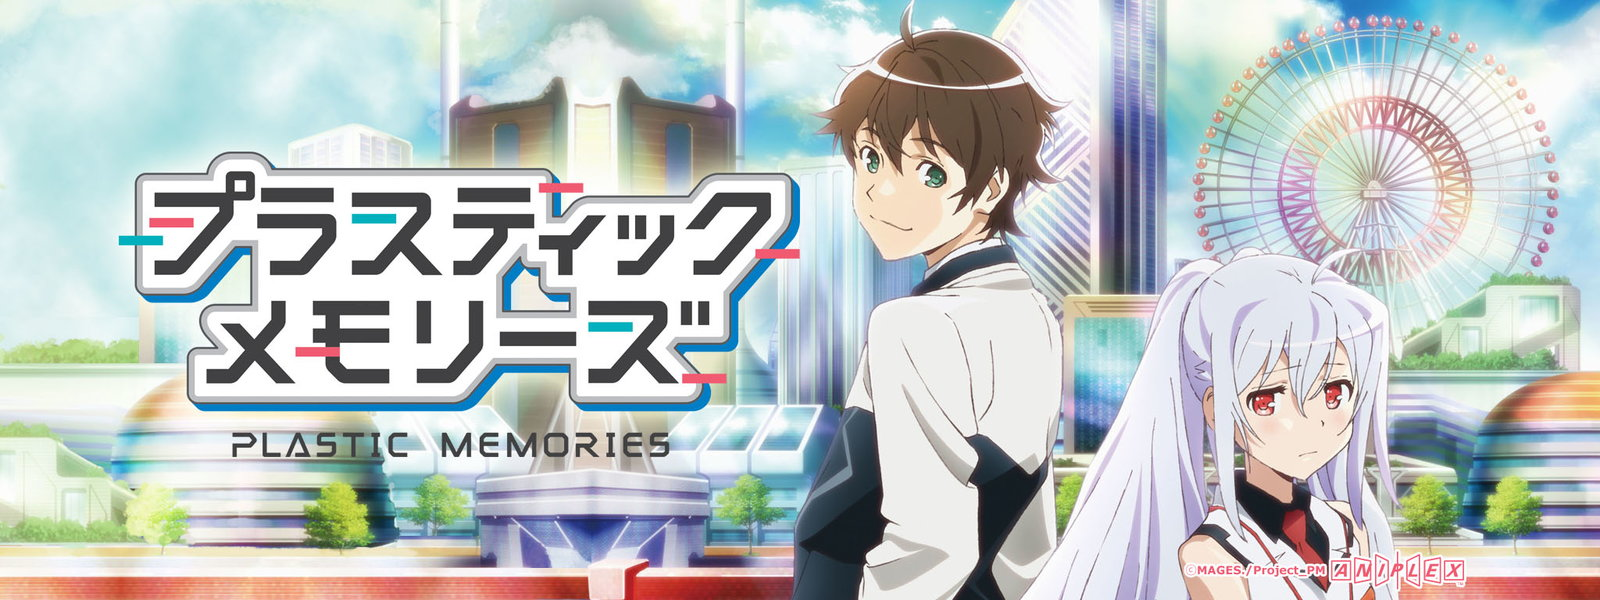 Otaku Nuts Plastic Memories Anime Review